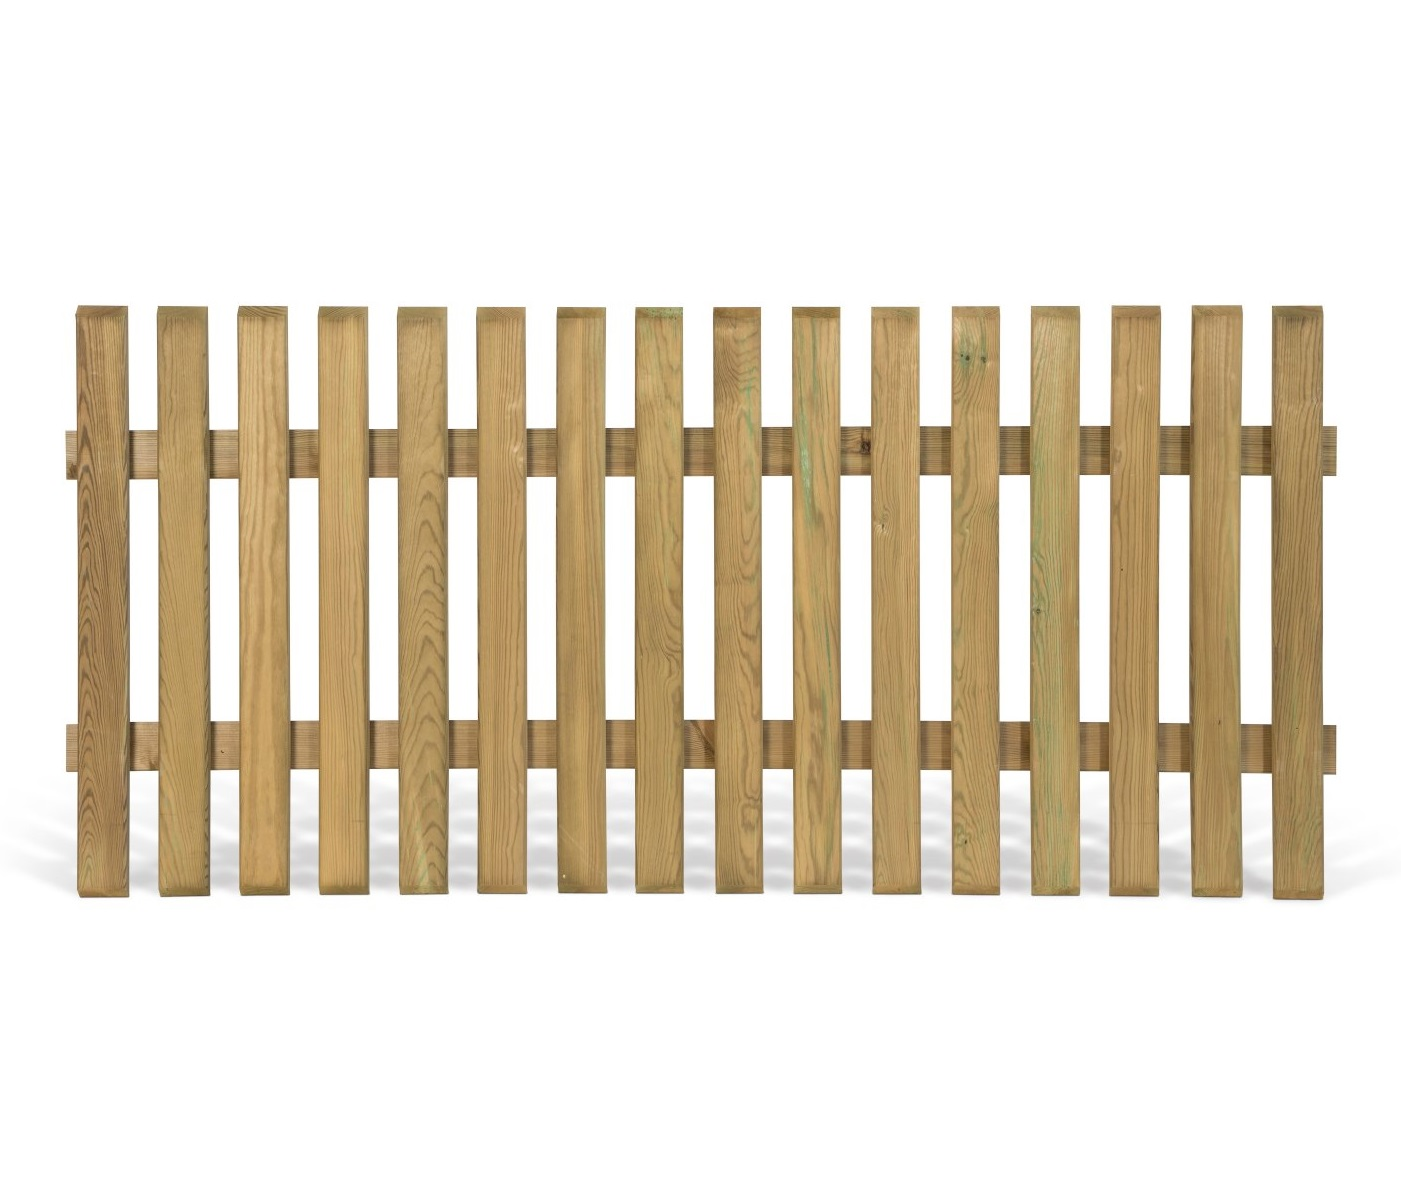 cl cl ture basse oxford vert 820x1760 v e h bois de construction. Black Bedroom Furniture Sets. Home Design Ideas